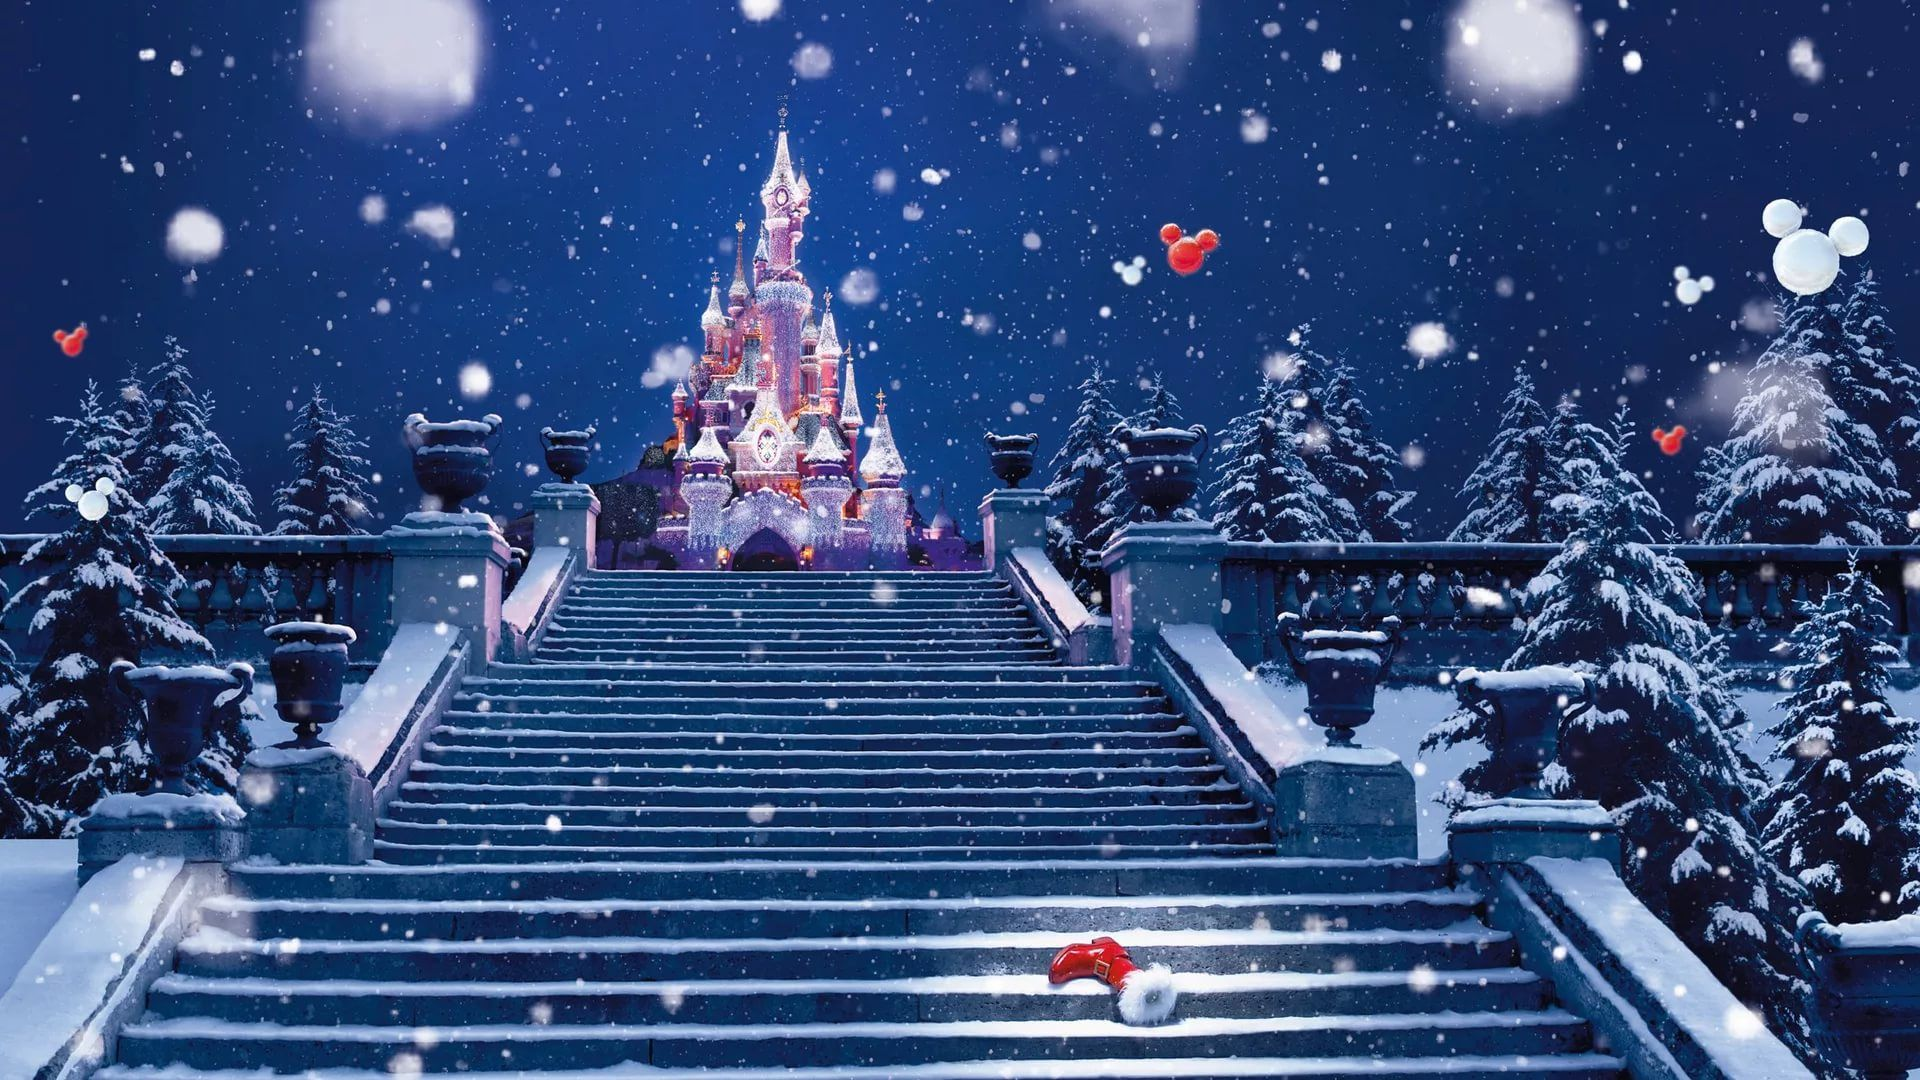 Disney Christmas background wallpaper